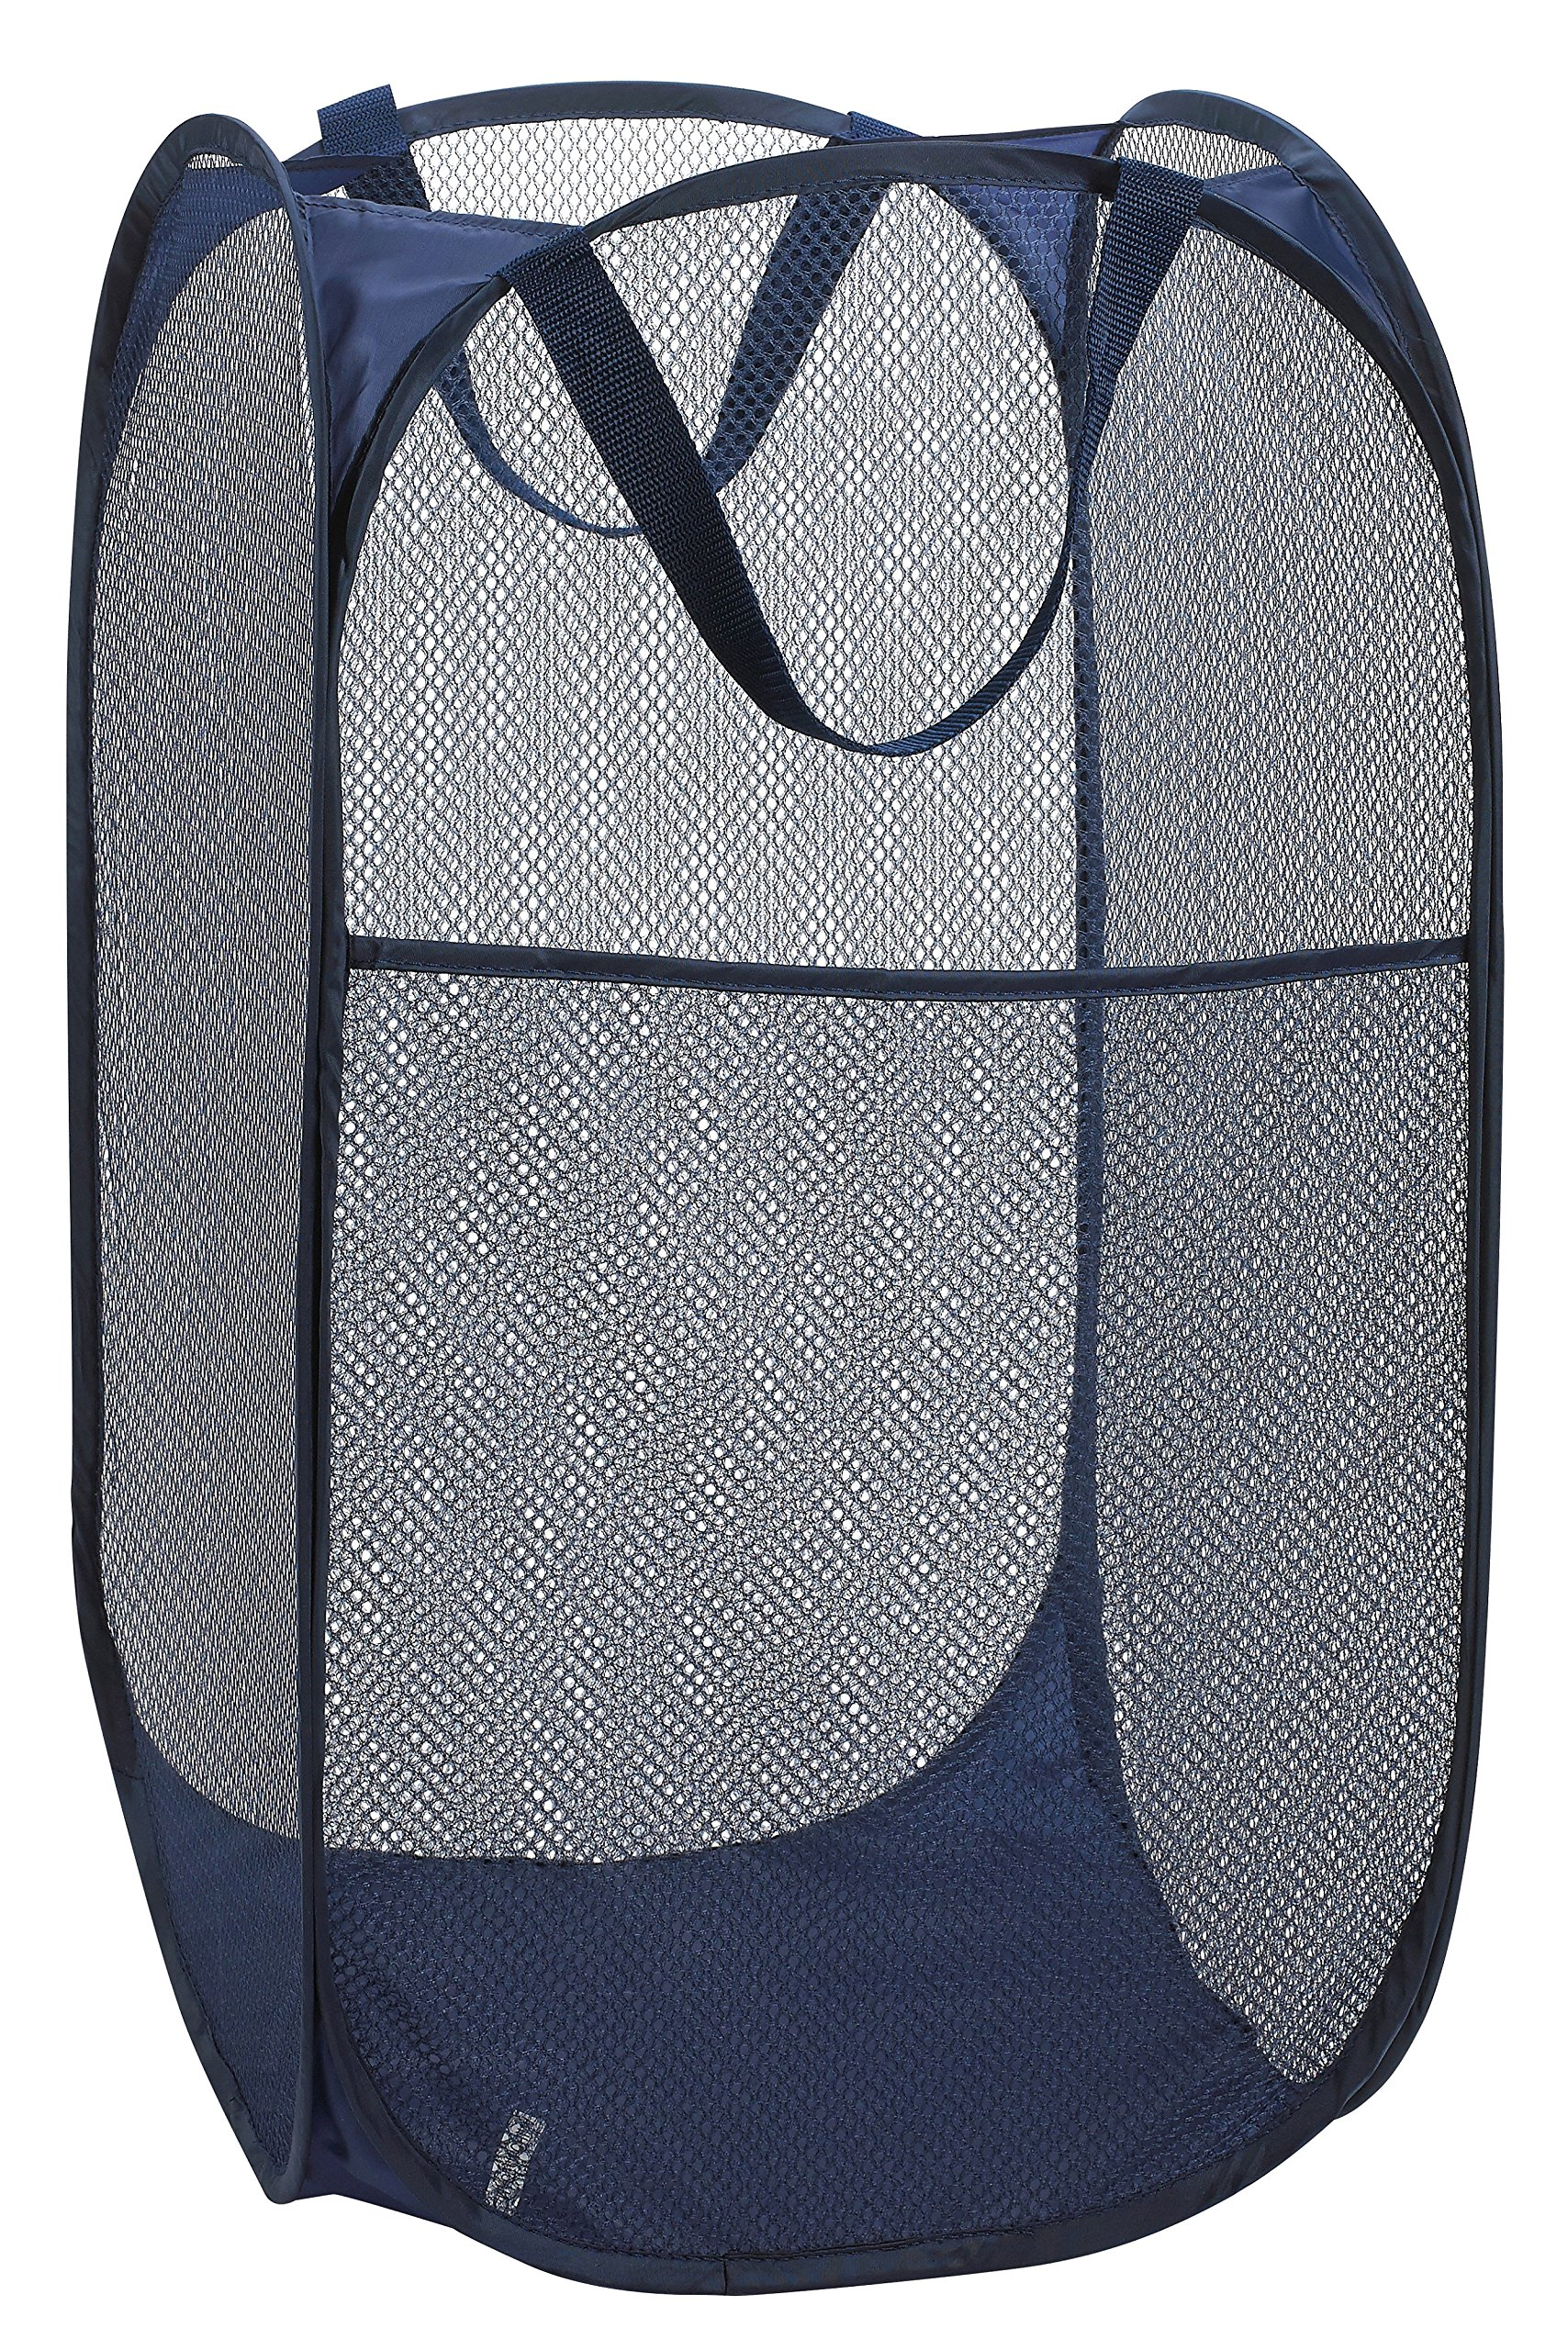 Hampers Mesh Material Helps Eliminate Laundry Odoroisture Great Hamper For College Dorm